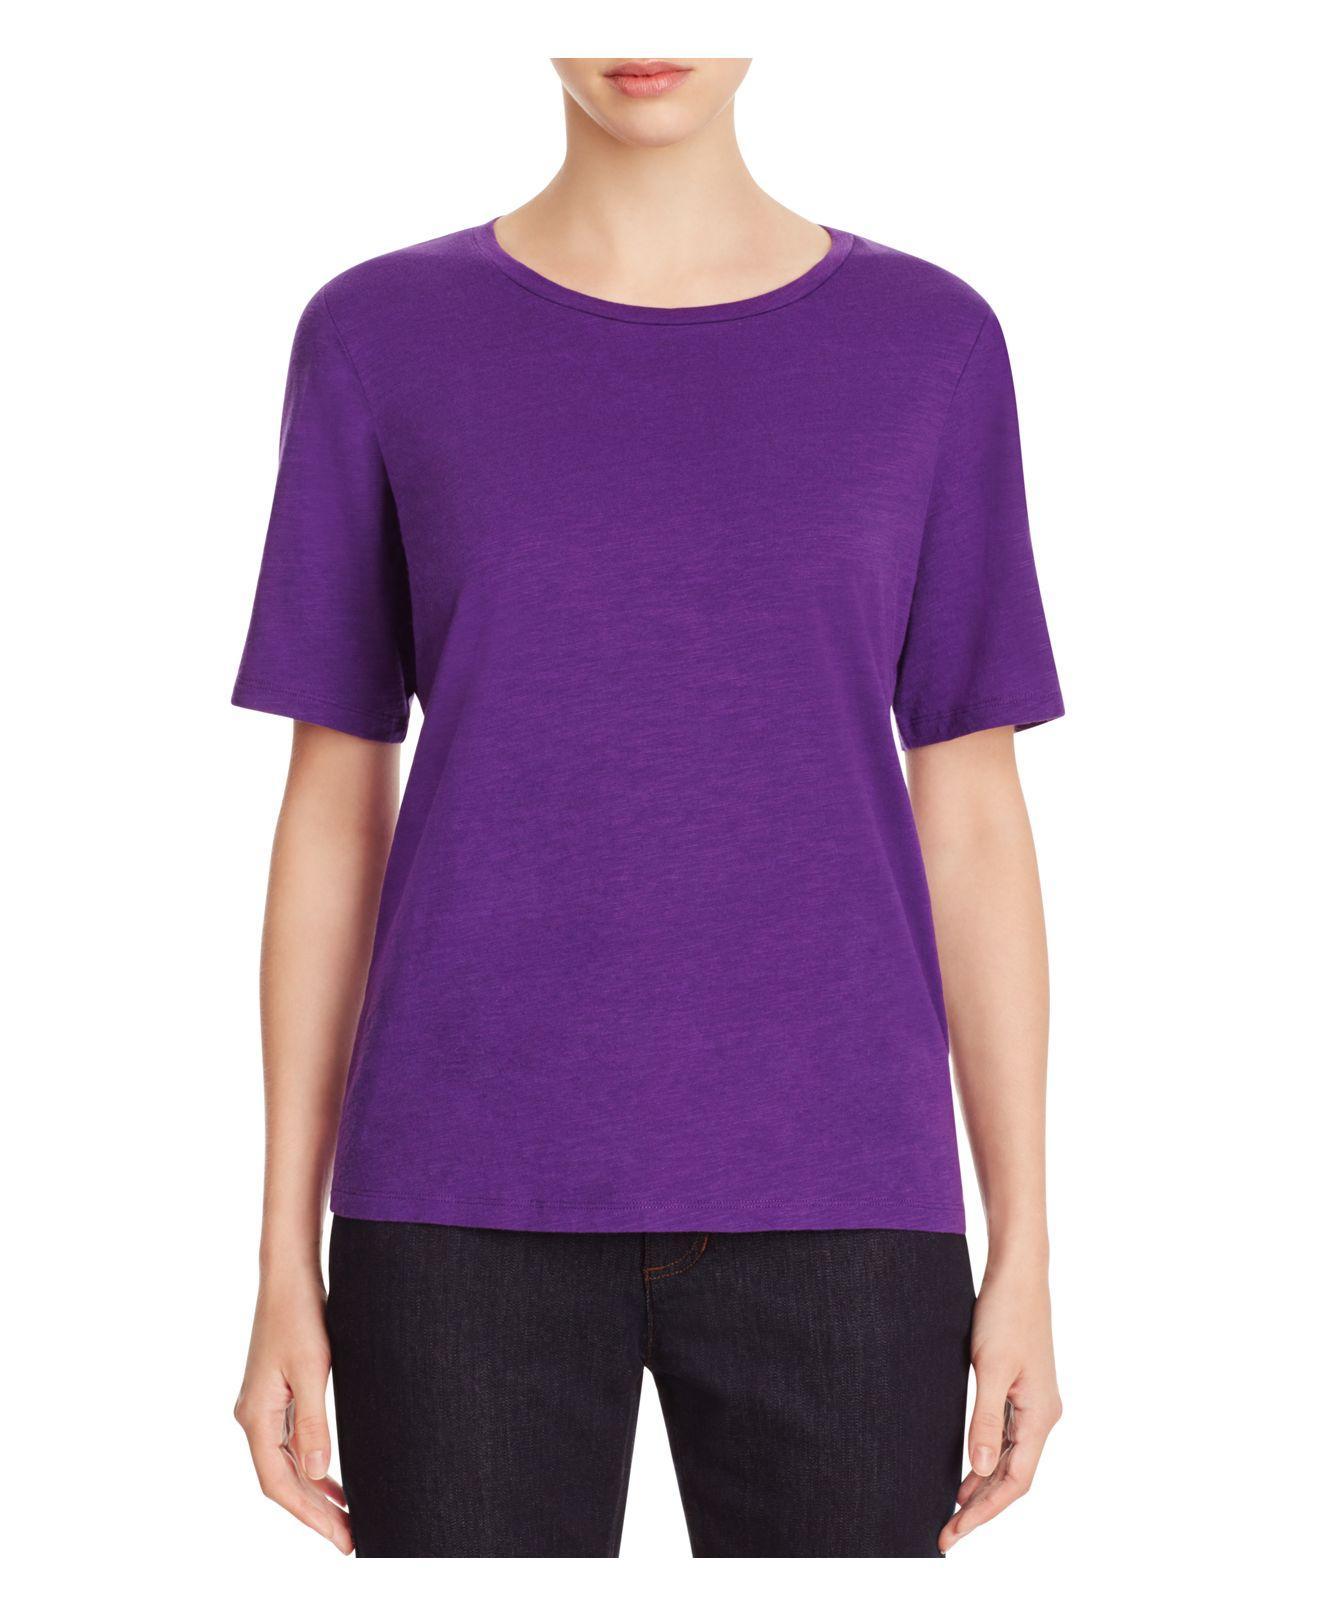 Lyst eileen fisher organic cotton heathered tee in purple for Eileen fisher organic cotton t shirt